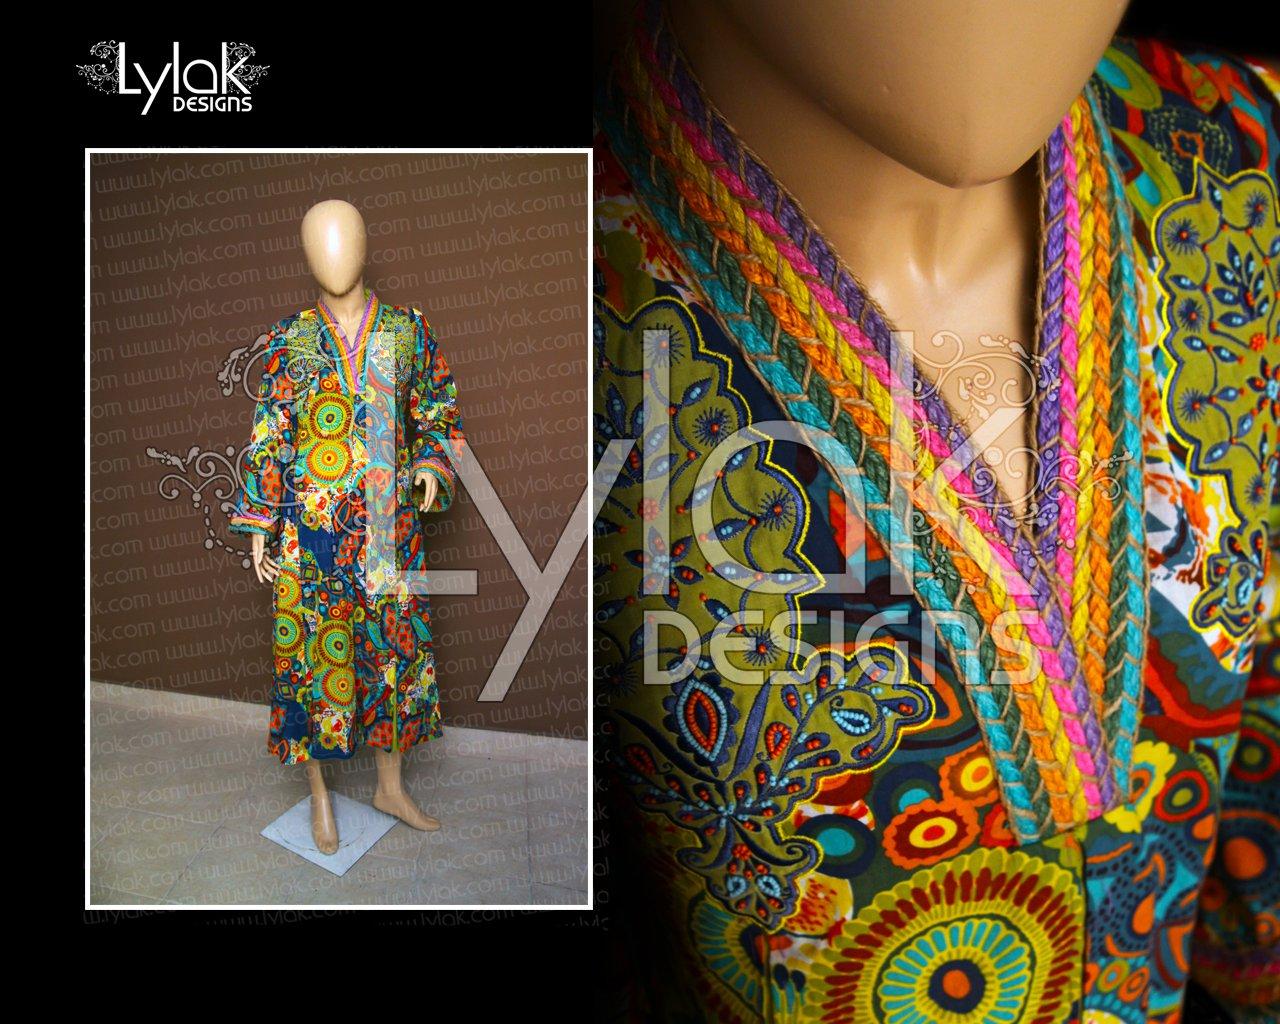 Casual wear by Lylak Designs 005